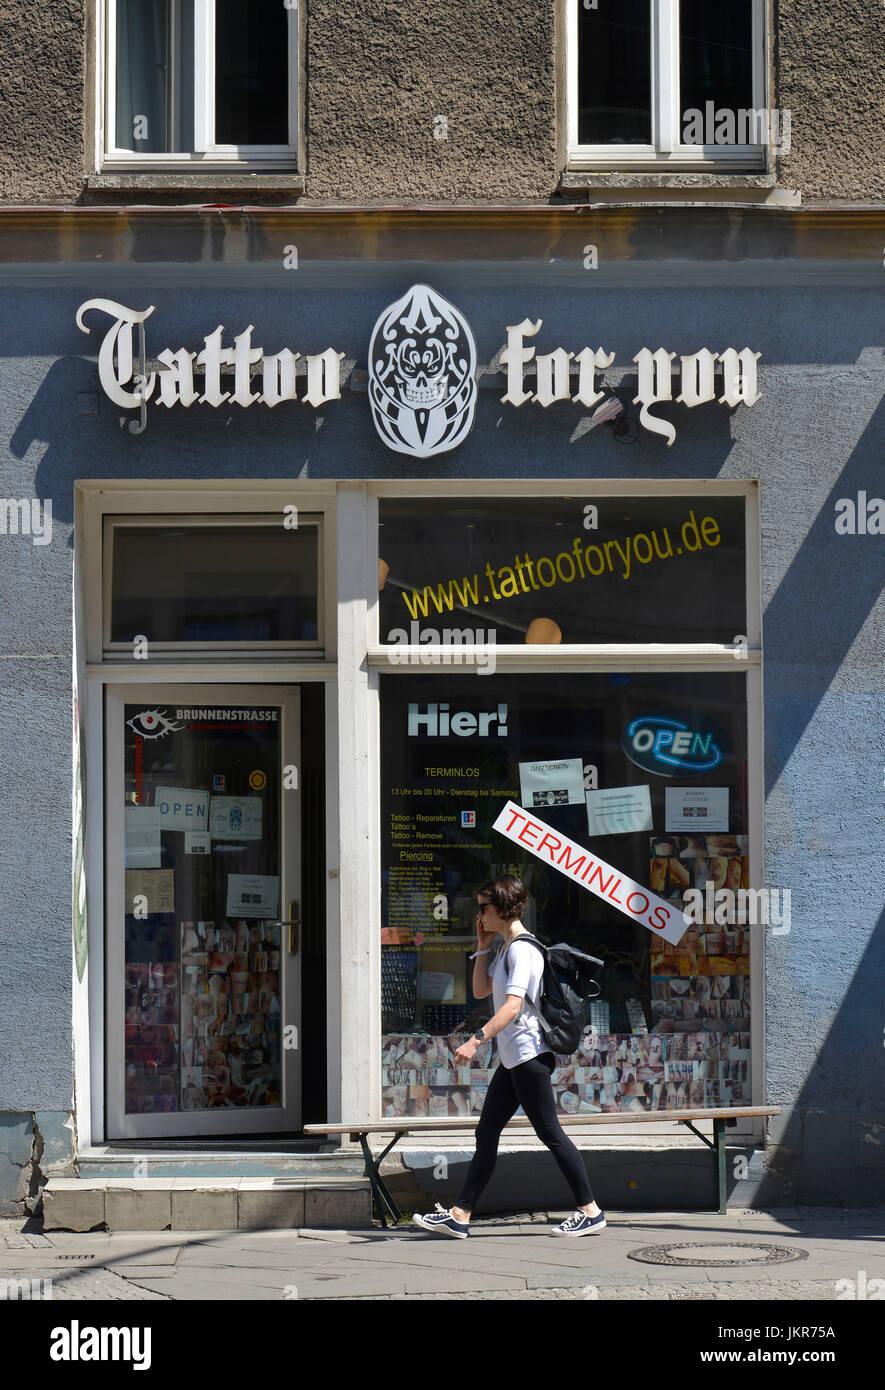 Tattoos Berlin Germany Stockfotos und  bilder Kaufen   Alamy